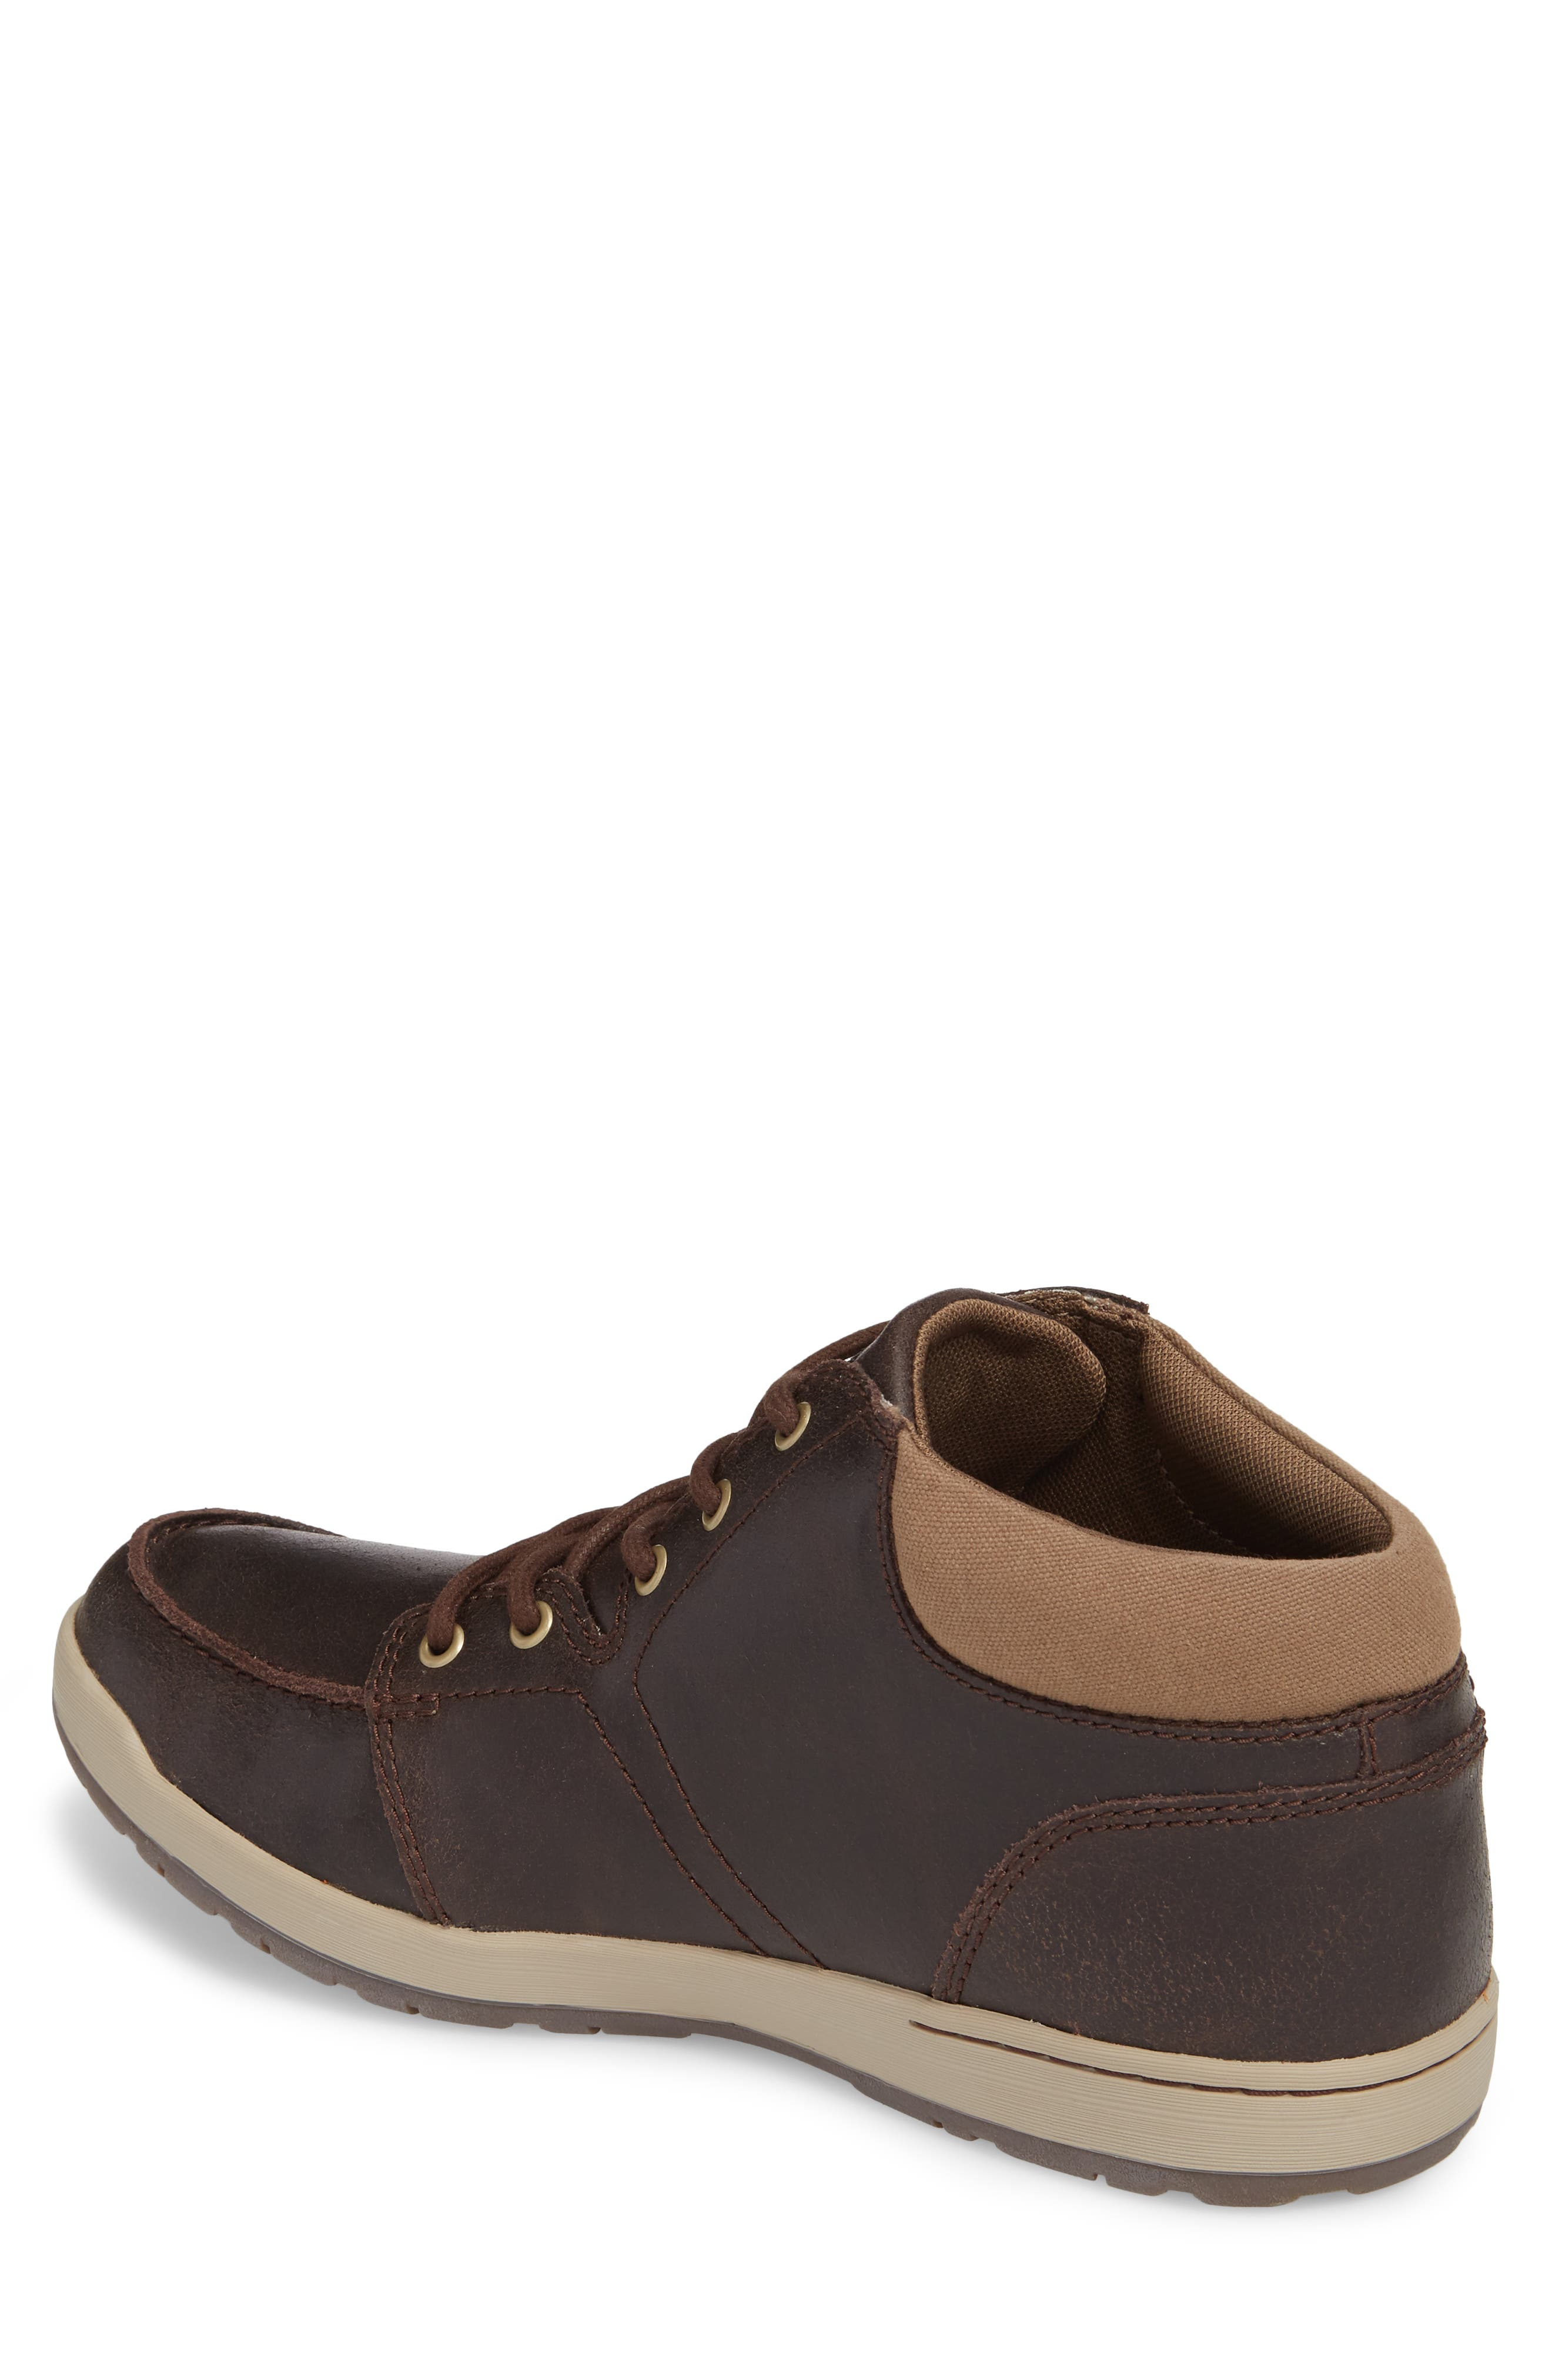 Ballard Evo Moc Toe Boot,                             Alternate thumbnail 2, color,                             Demitasse Brown